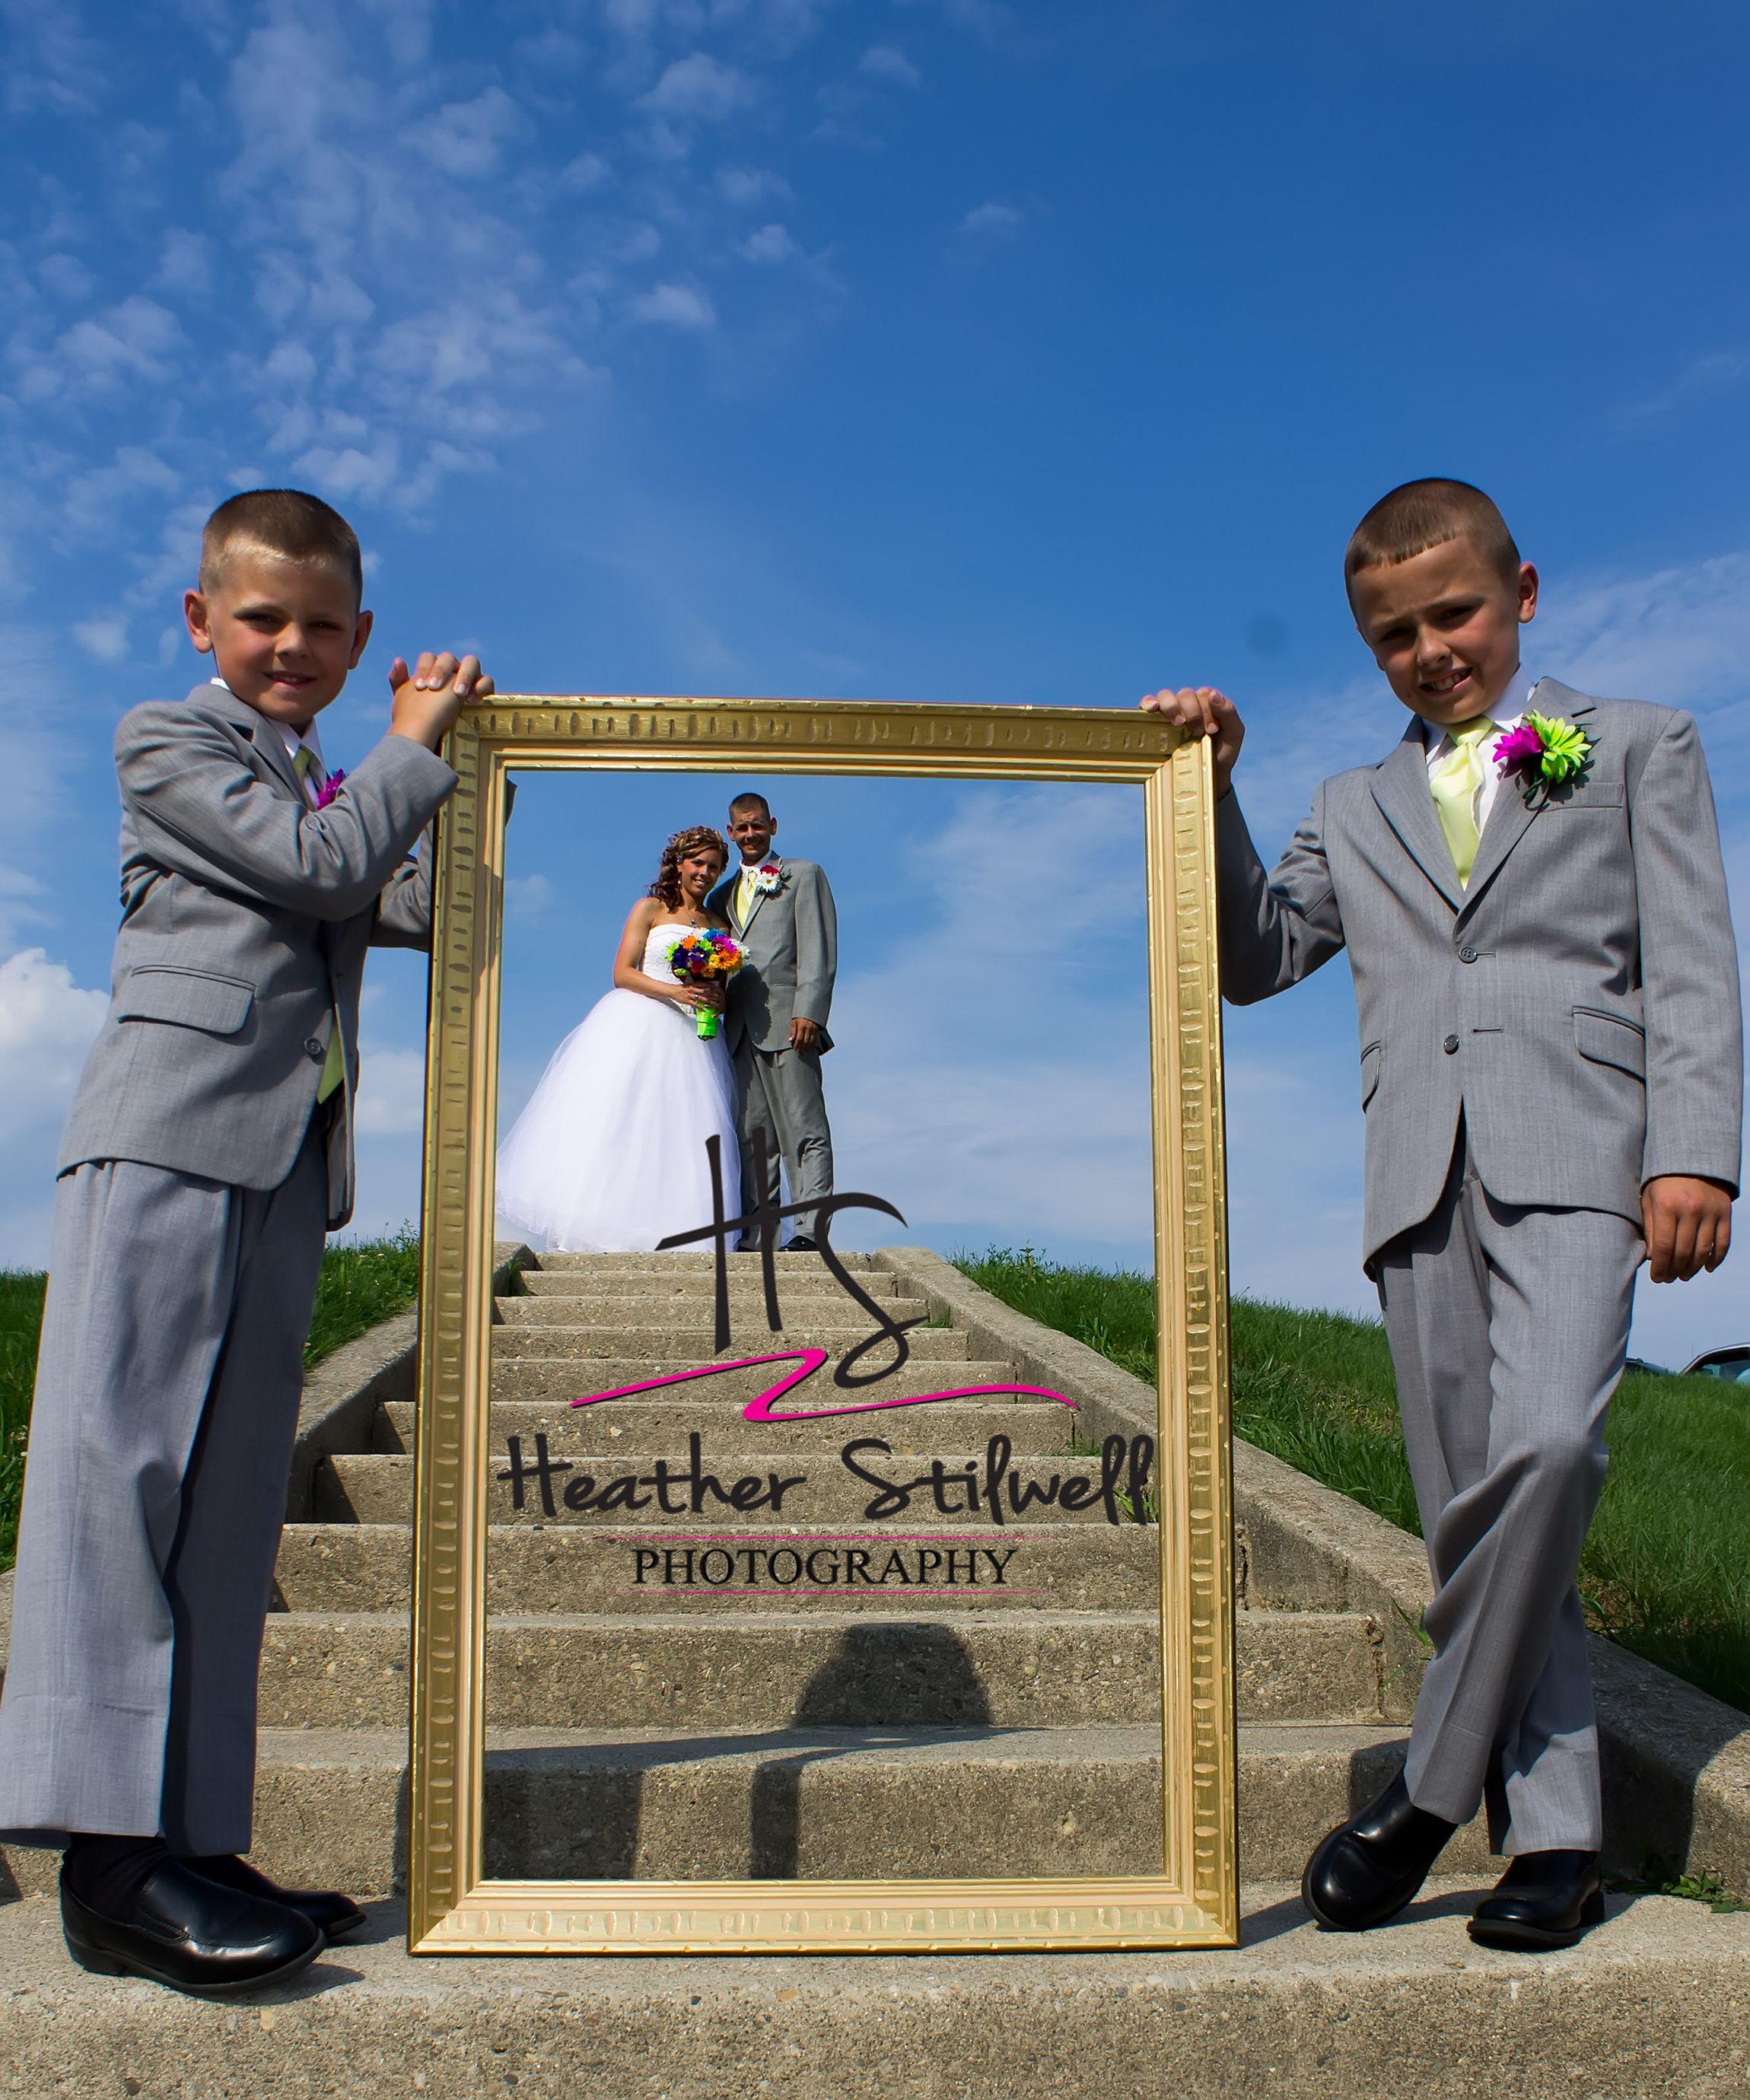 Weddings Summer Ahop Xenia Ohio C 2014 Heather Stilwell Photography Llc Summer Wedding Photo Colour Photo